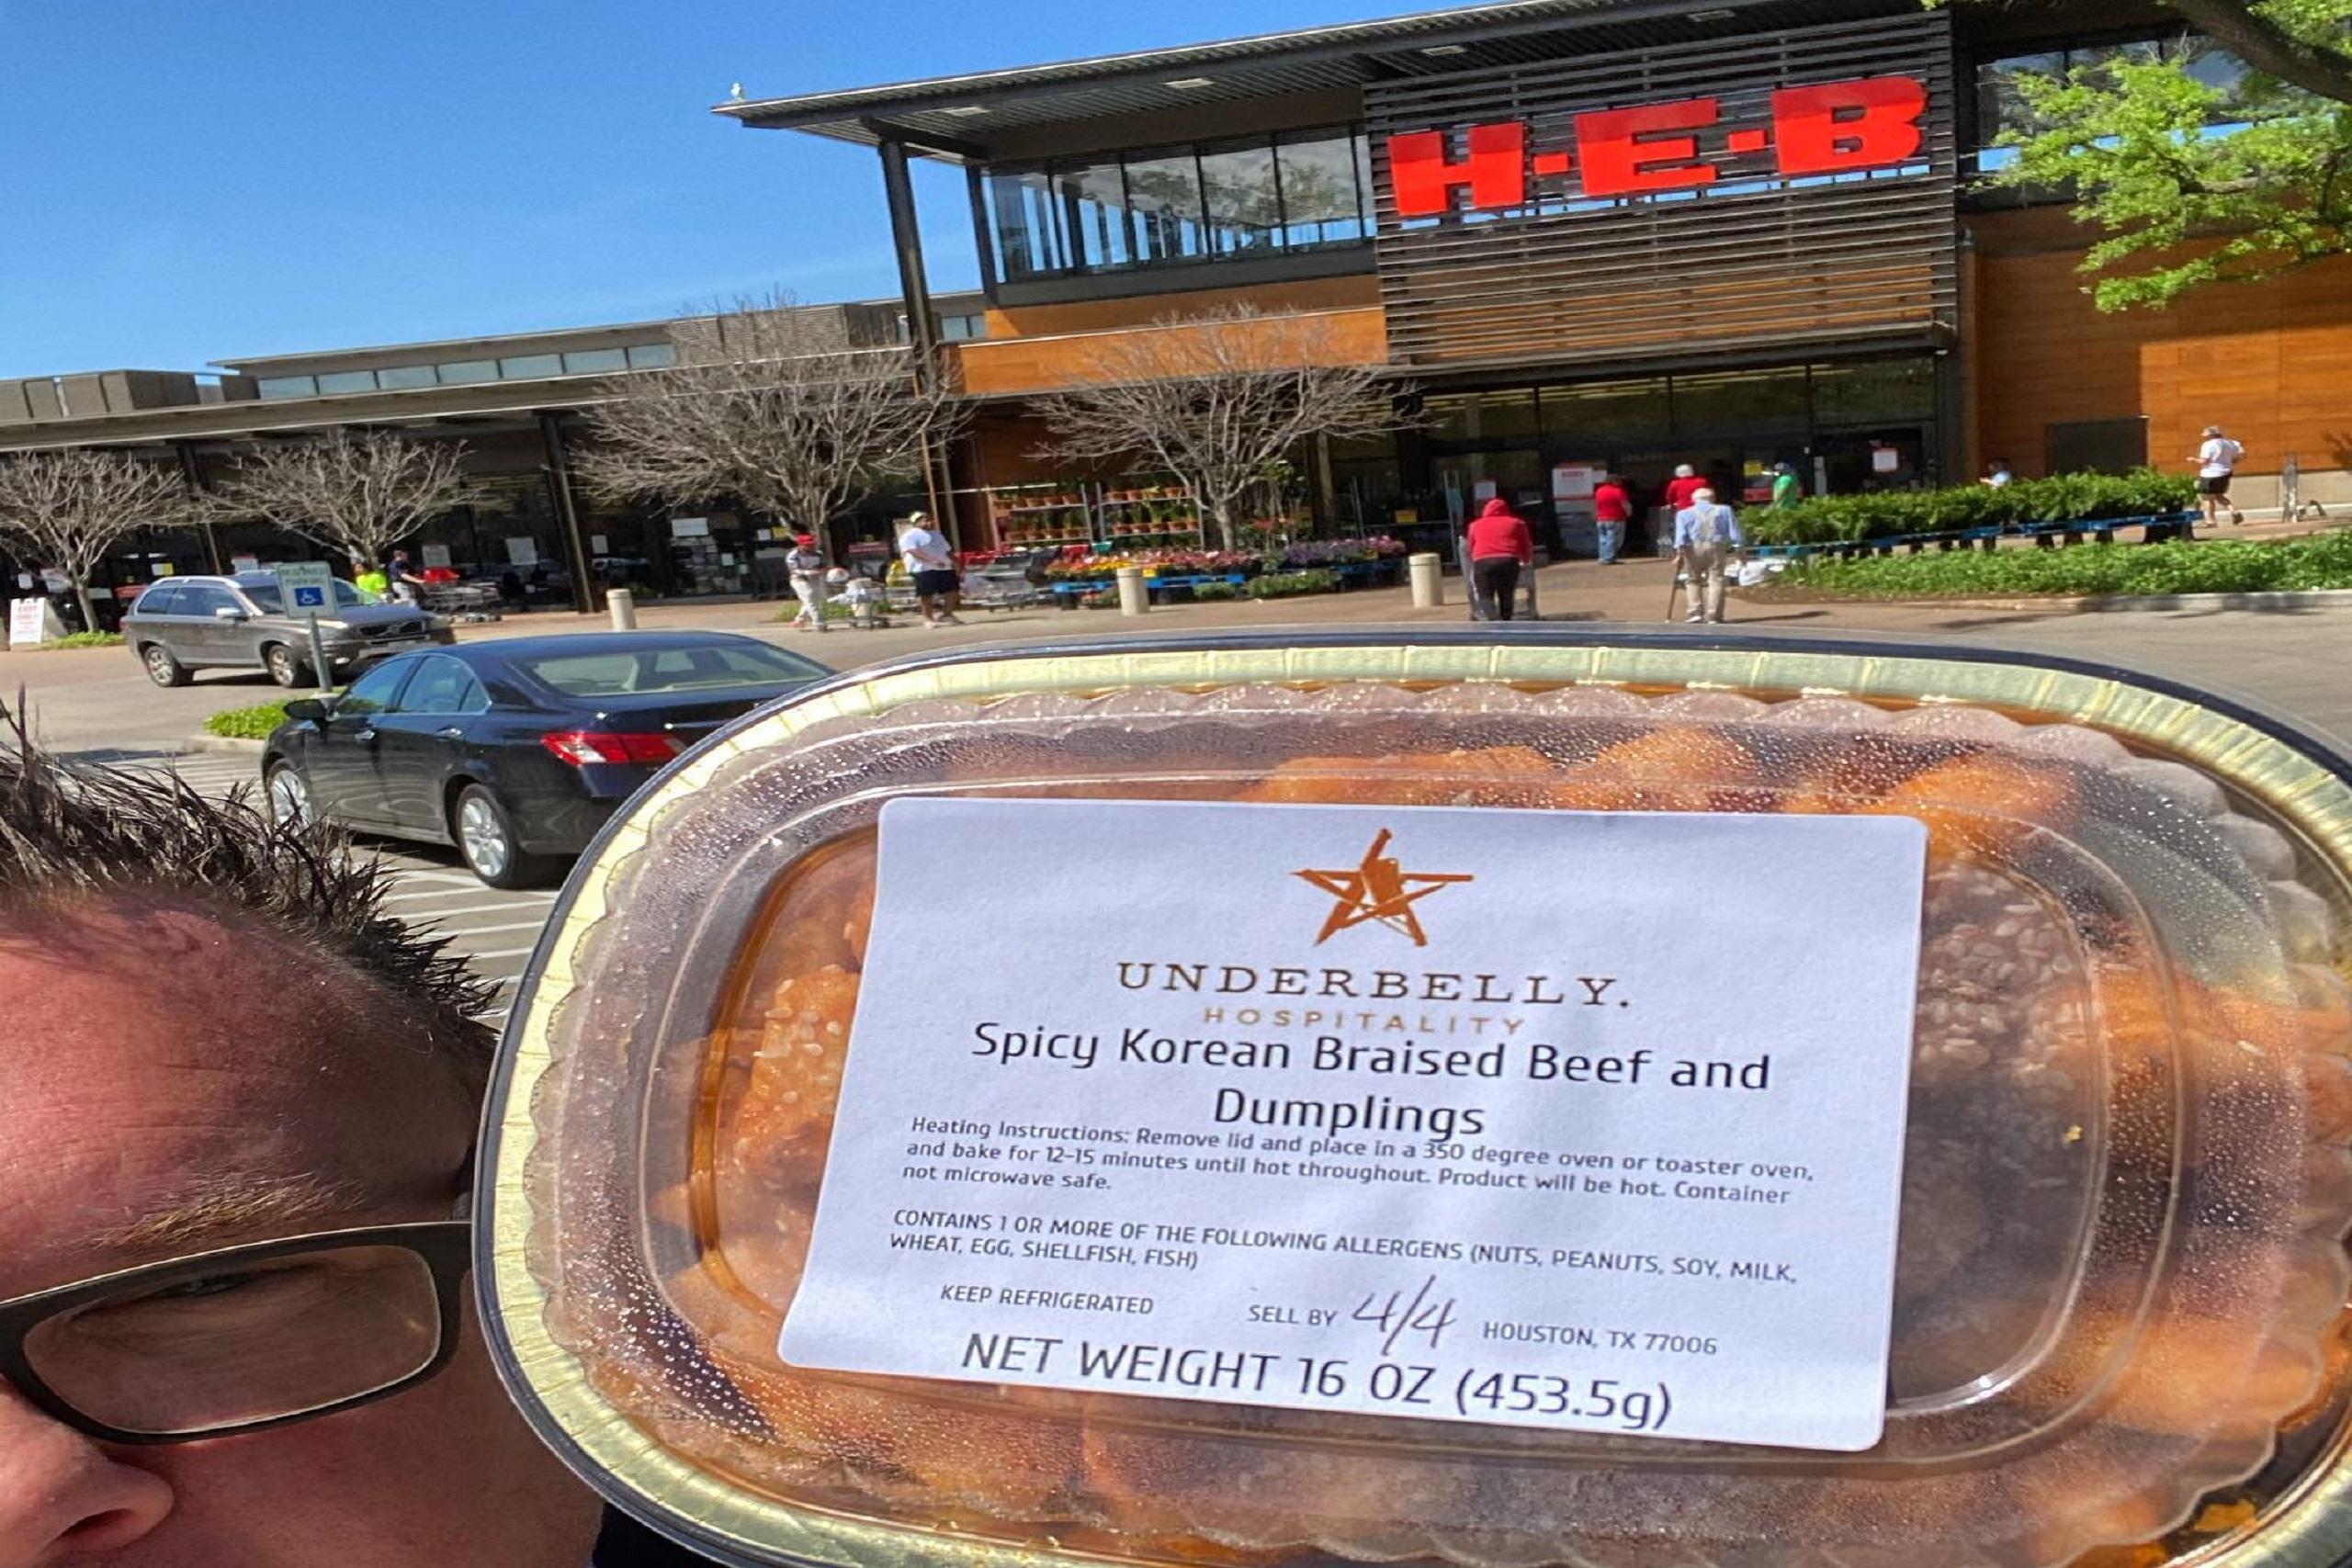 H-E-B launches program to support Texas restaurants - H-E-B Newsroom